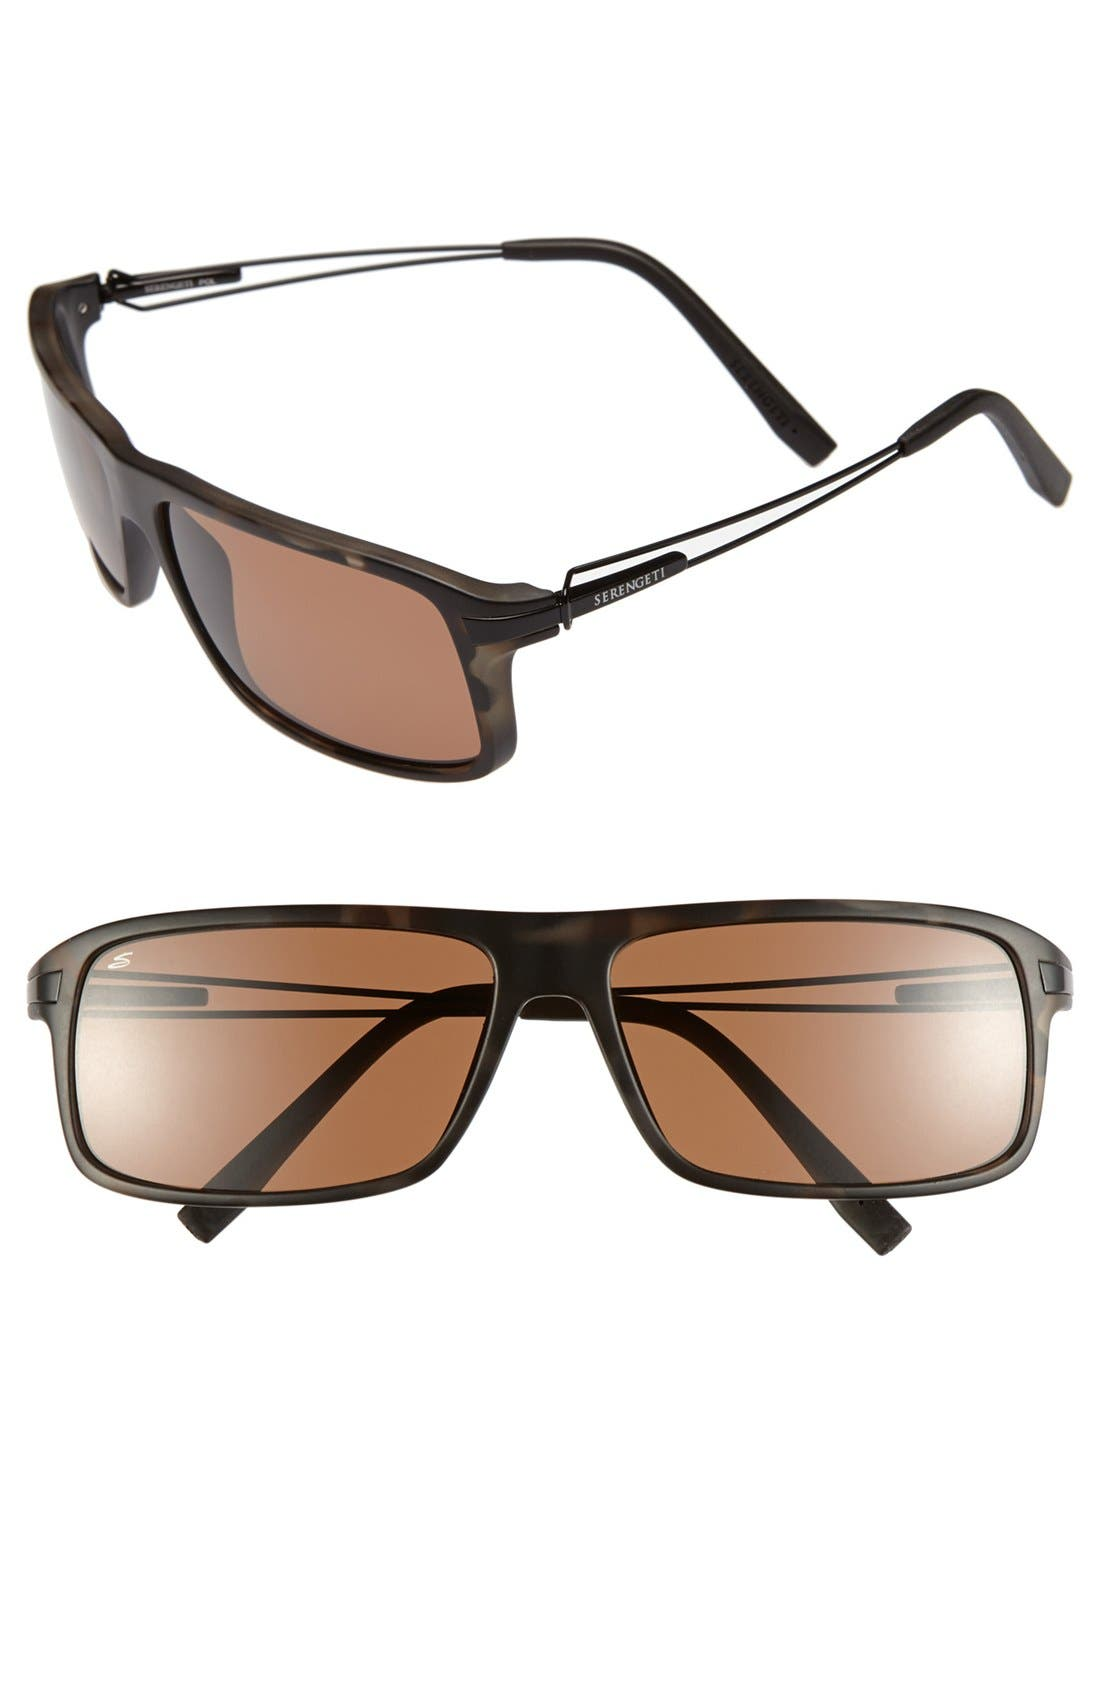 Alternate Image 1 Selected - Serengeti 'Rivoli' 65mm Polarized Sunglasses